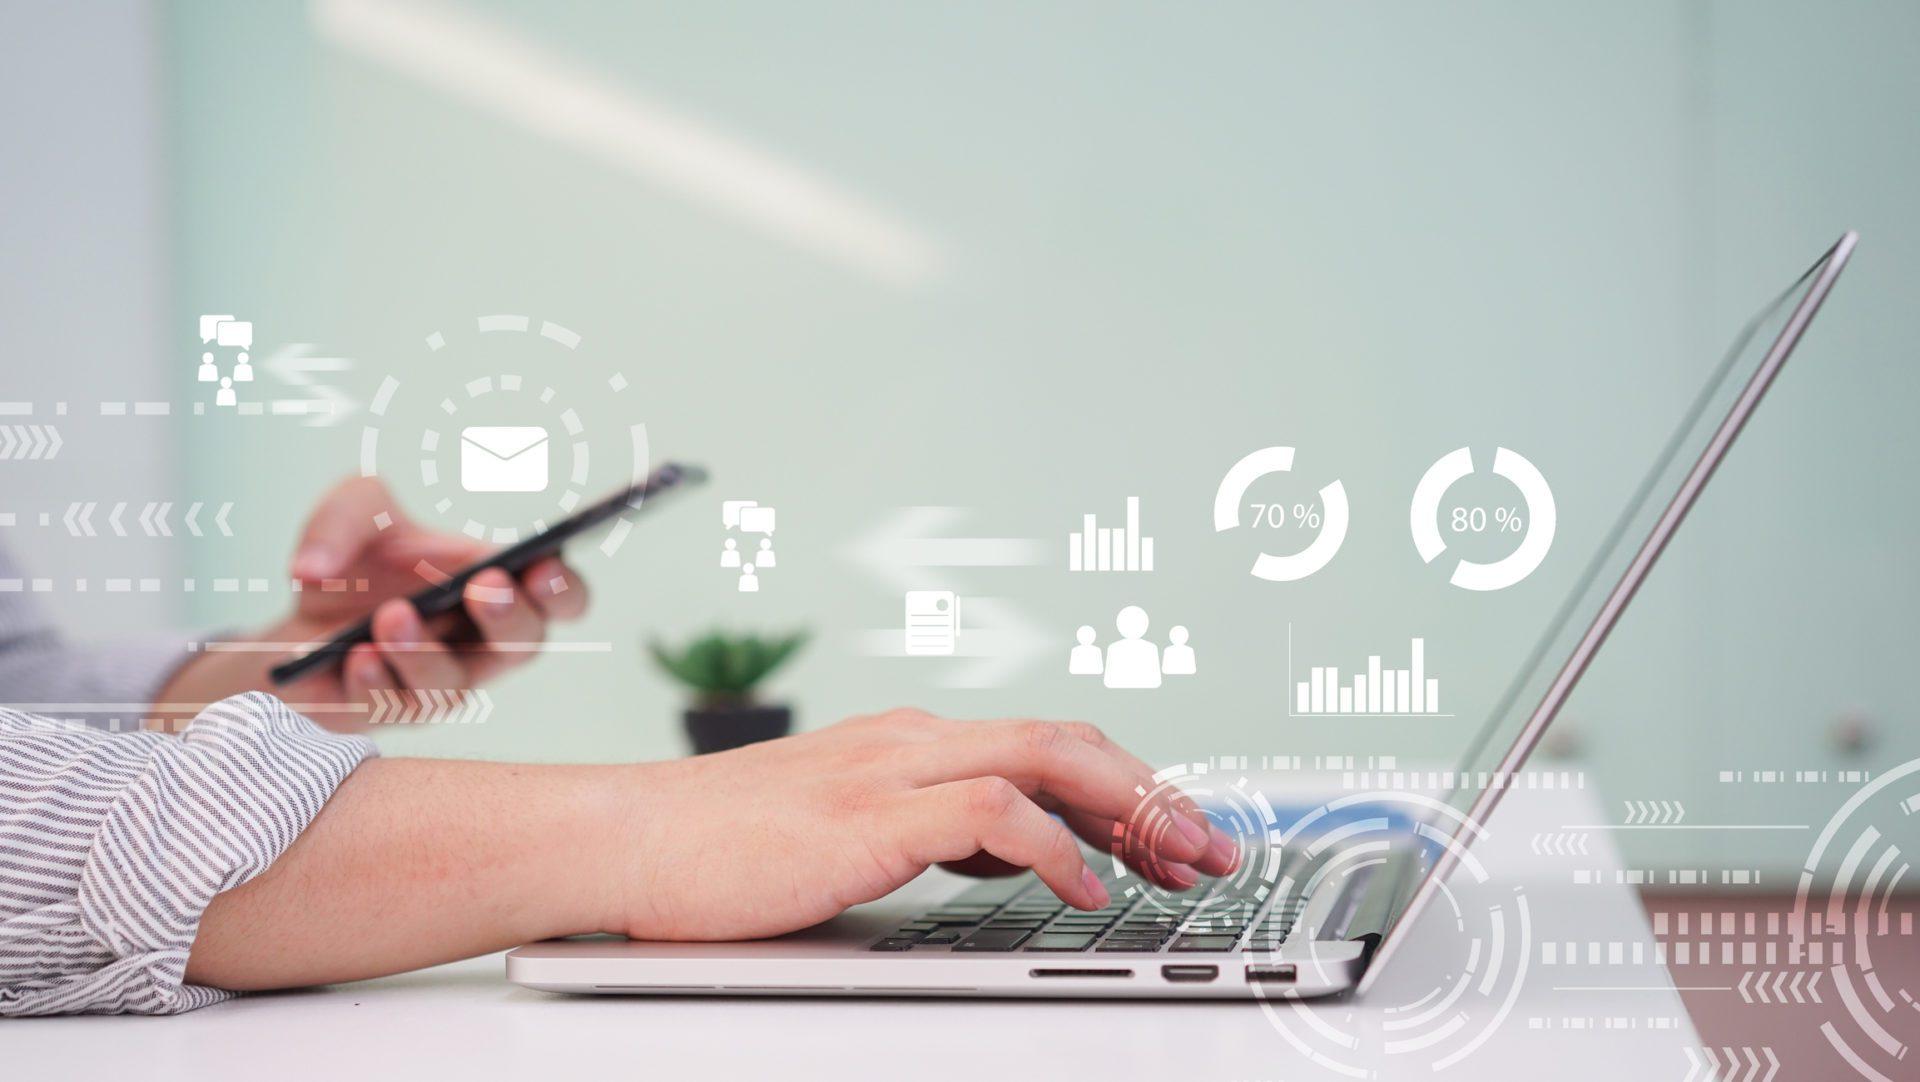 analytics icons over laptop show knowledge management metrics